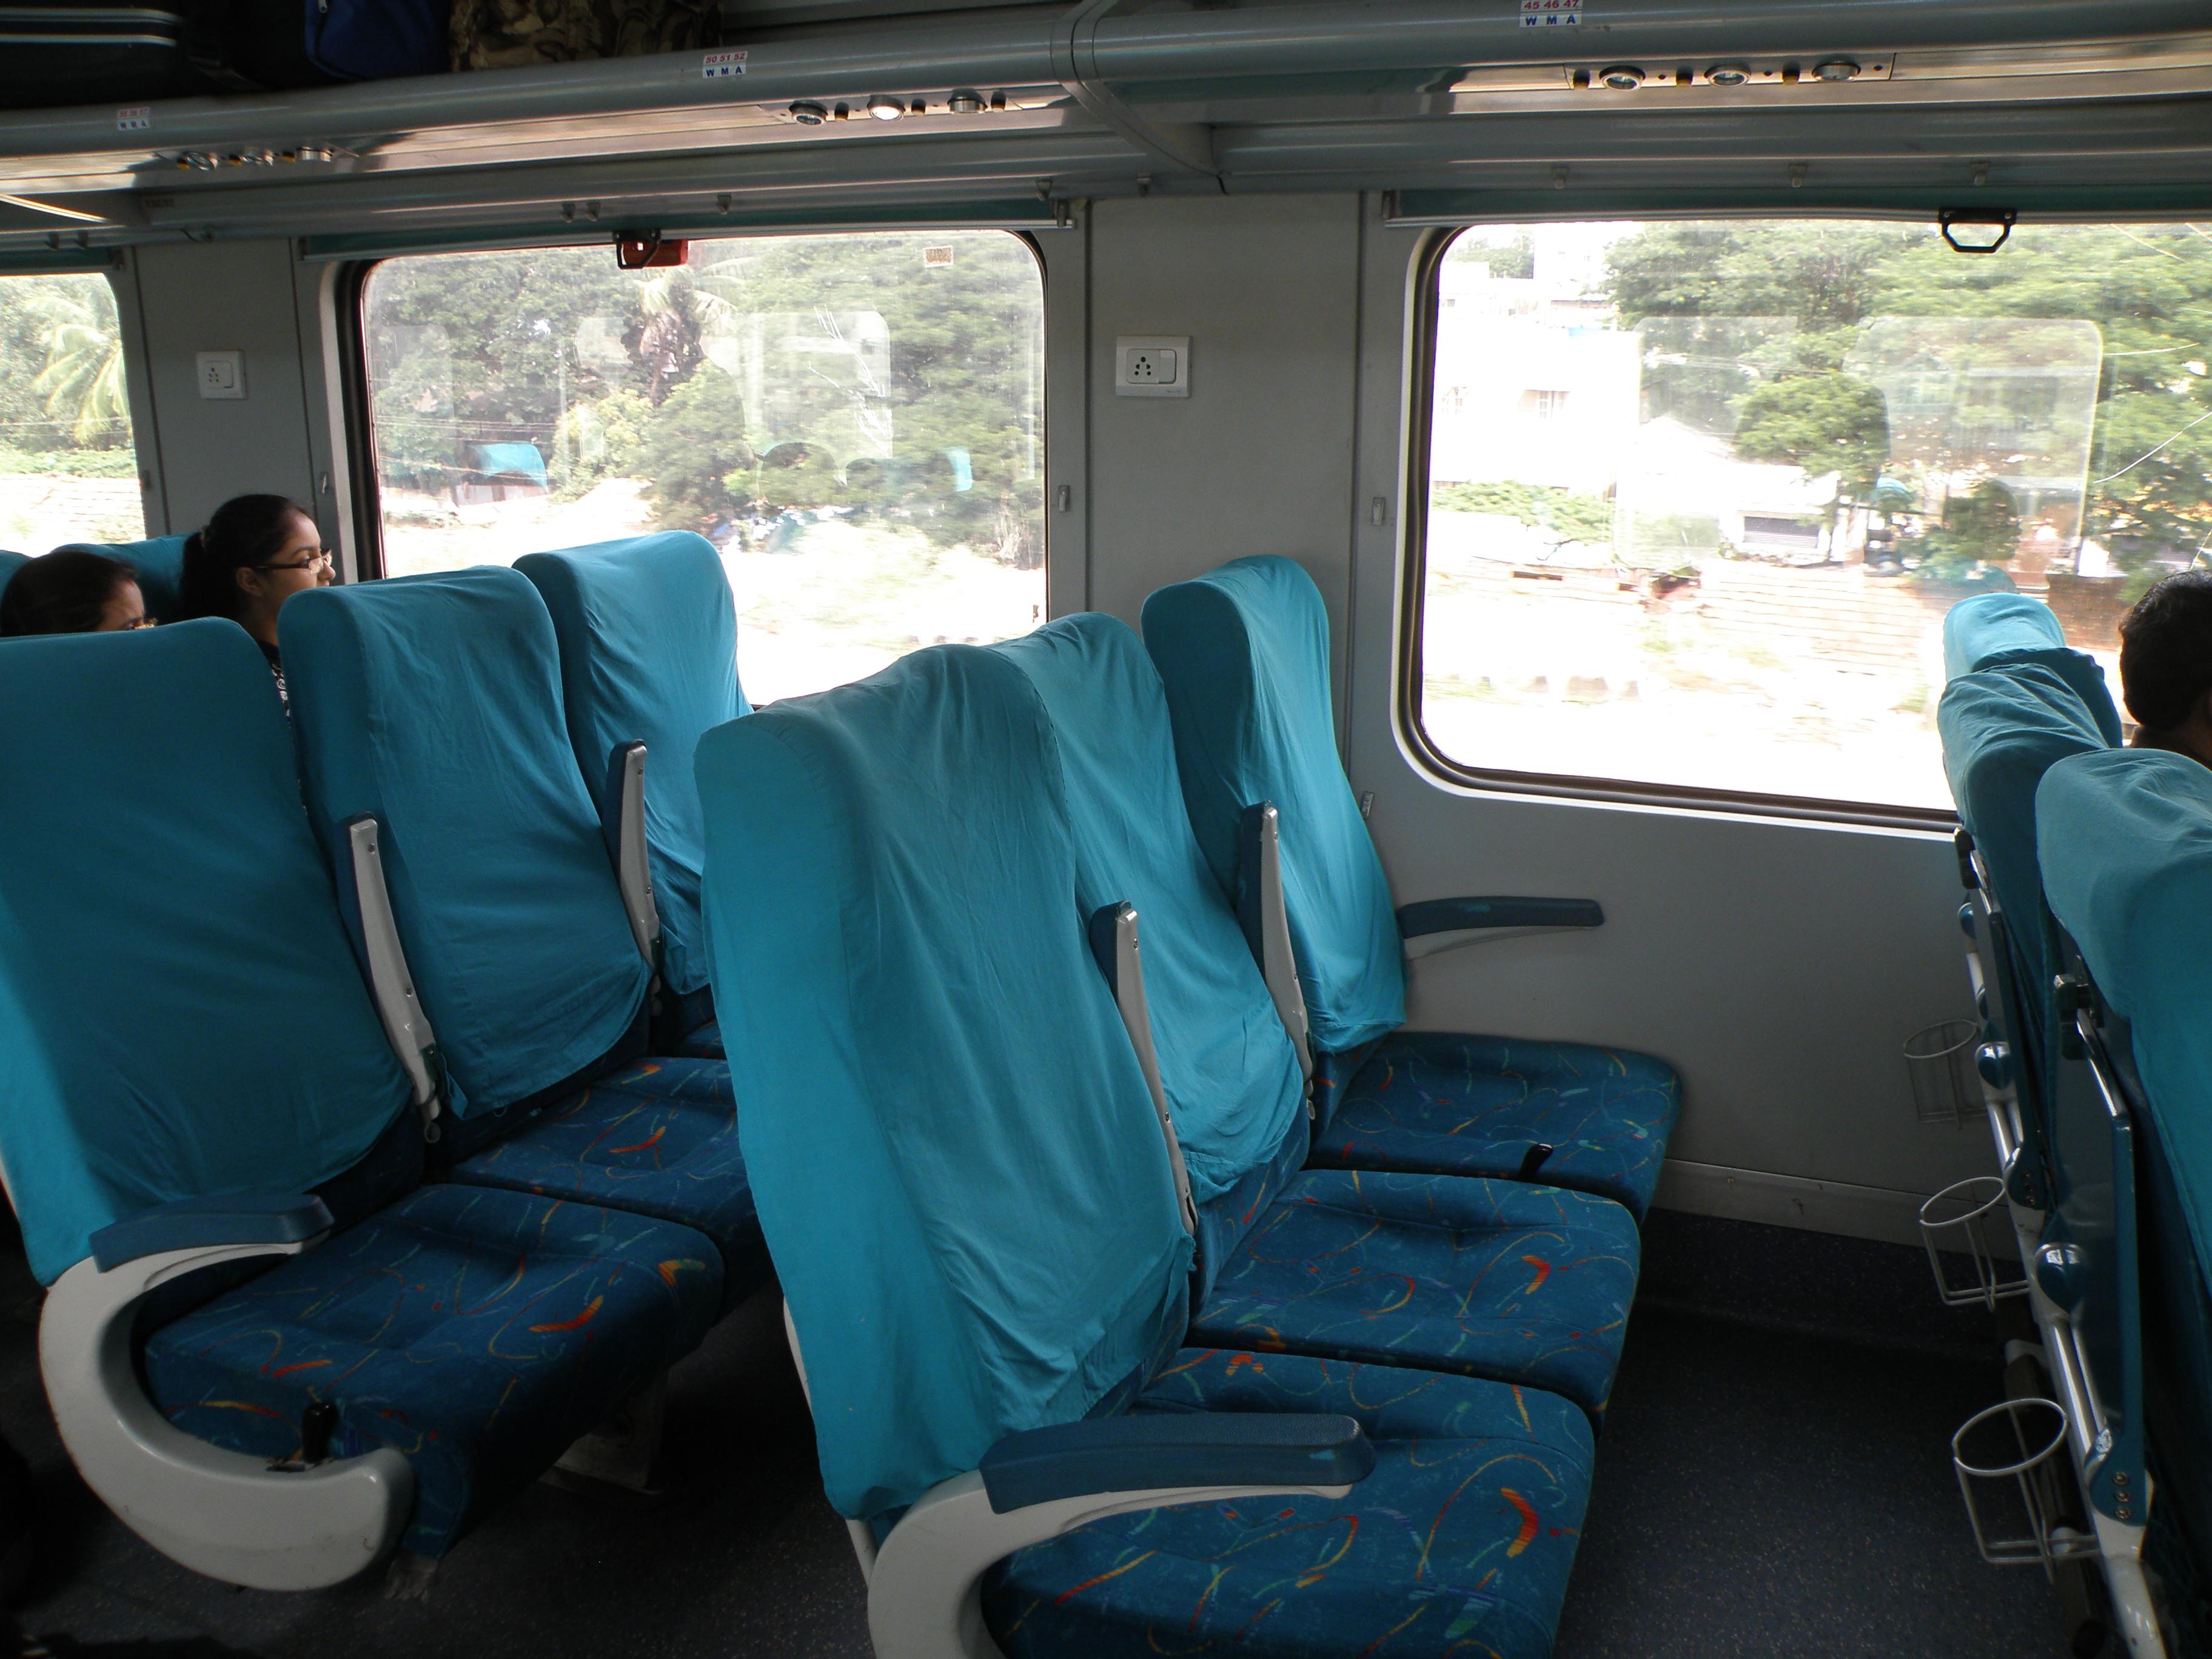 file cc class seats in mysore shatabdi jpg wikimedia commons